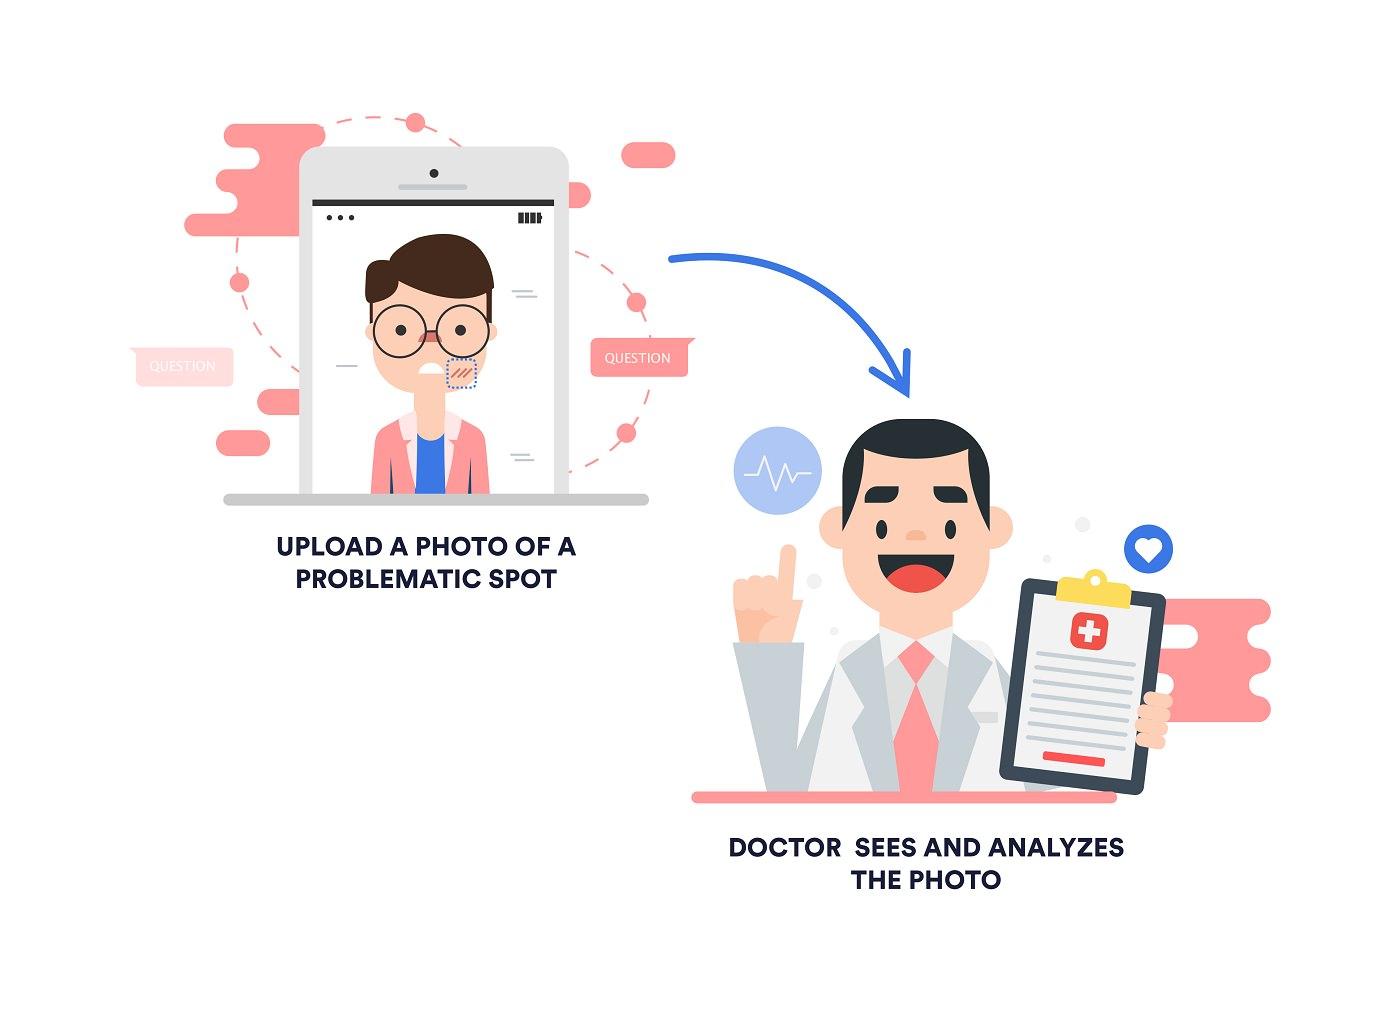 Telemedicine App Development How To Start A Telemedicine Business Mind Studios